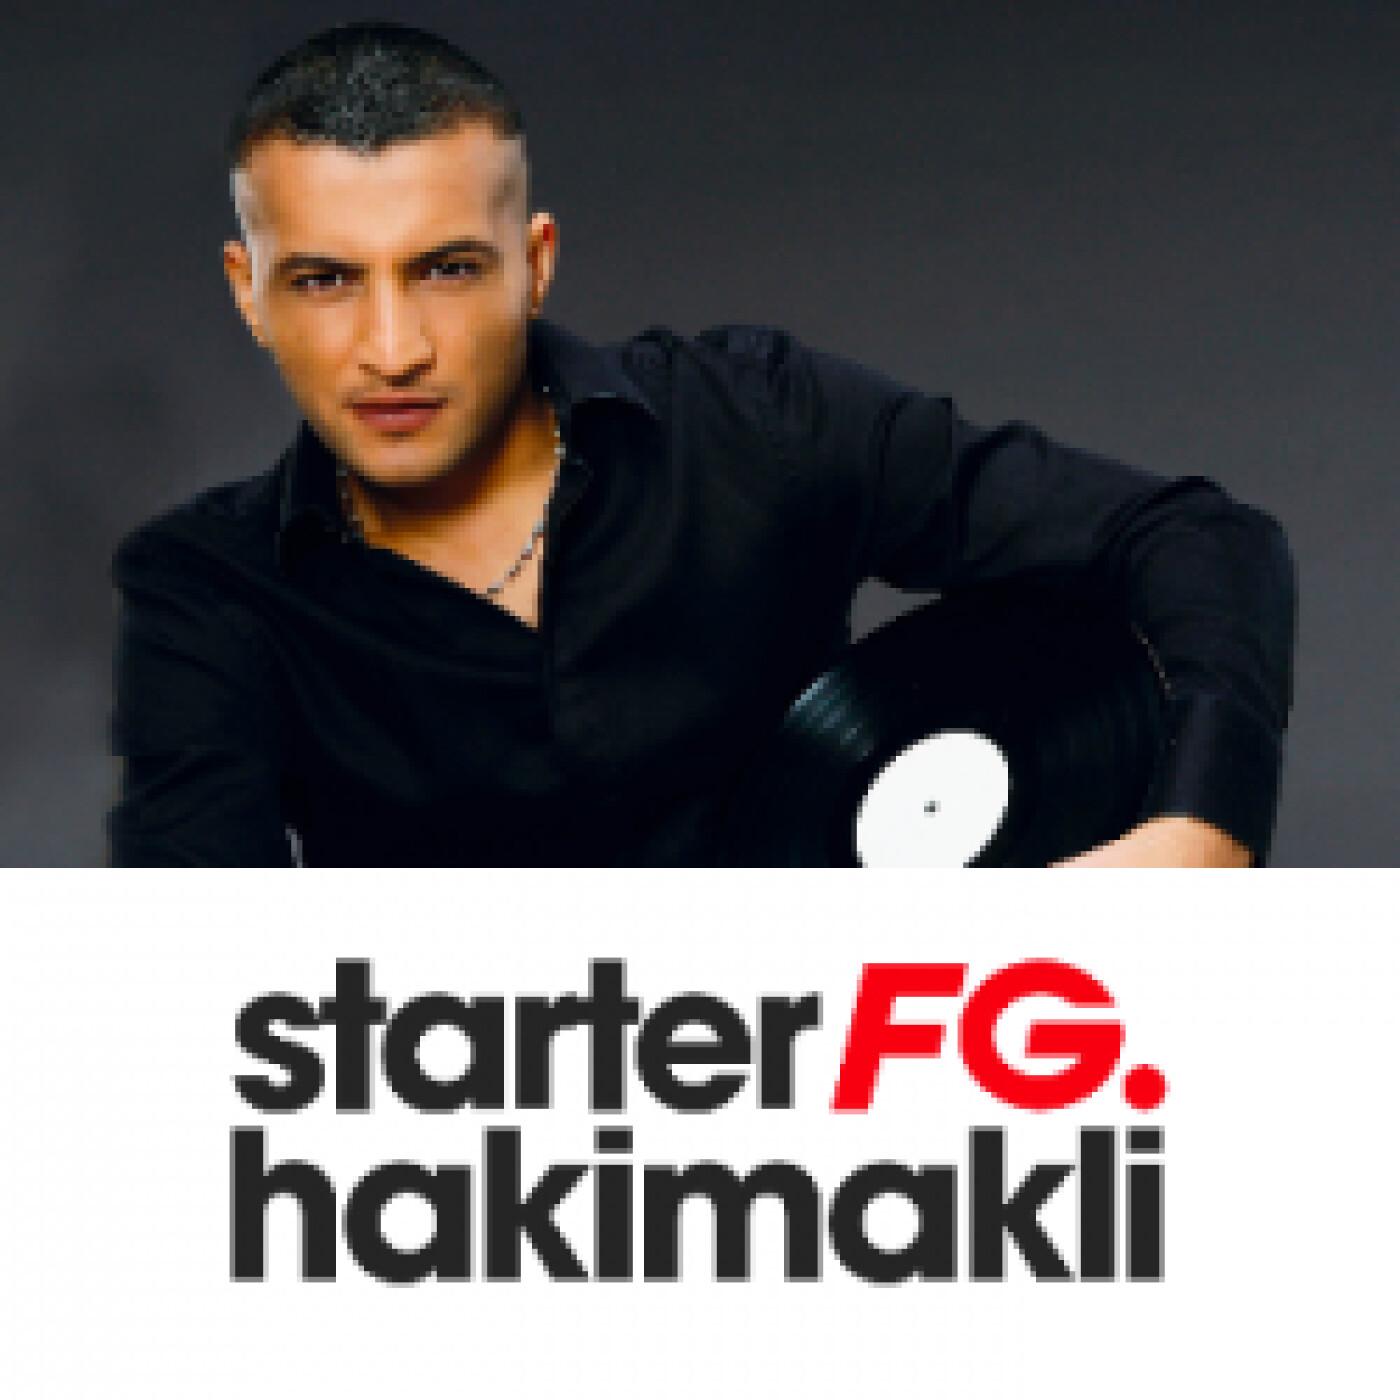 STARTER FG BY HAKIMAKLI MERCREDI 14 AVRIL 2021